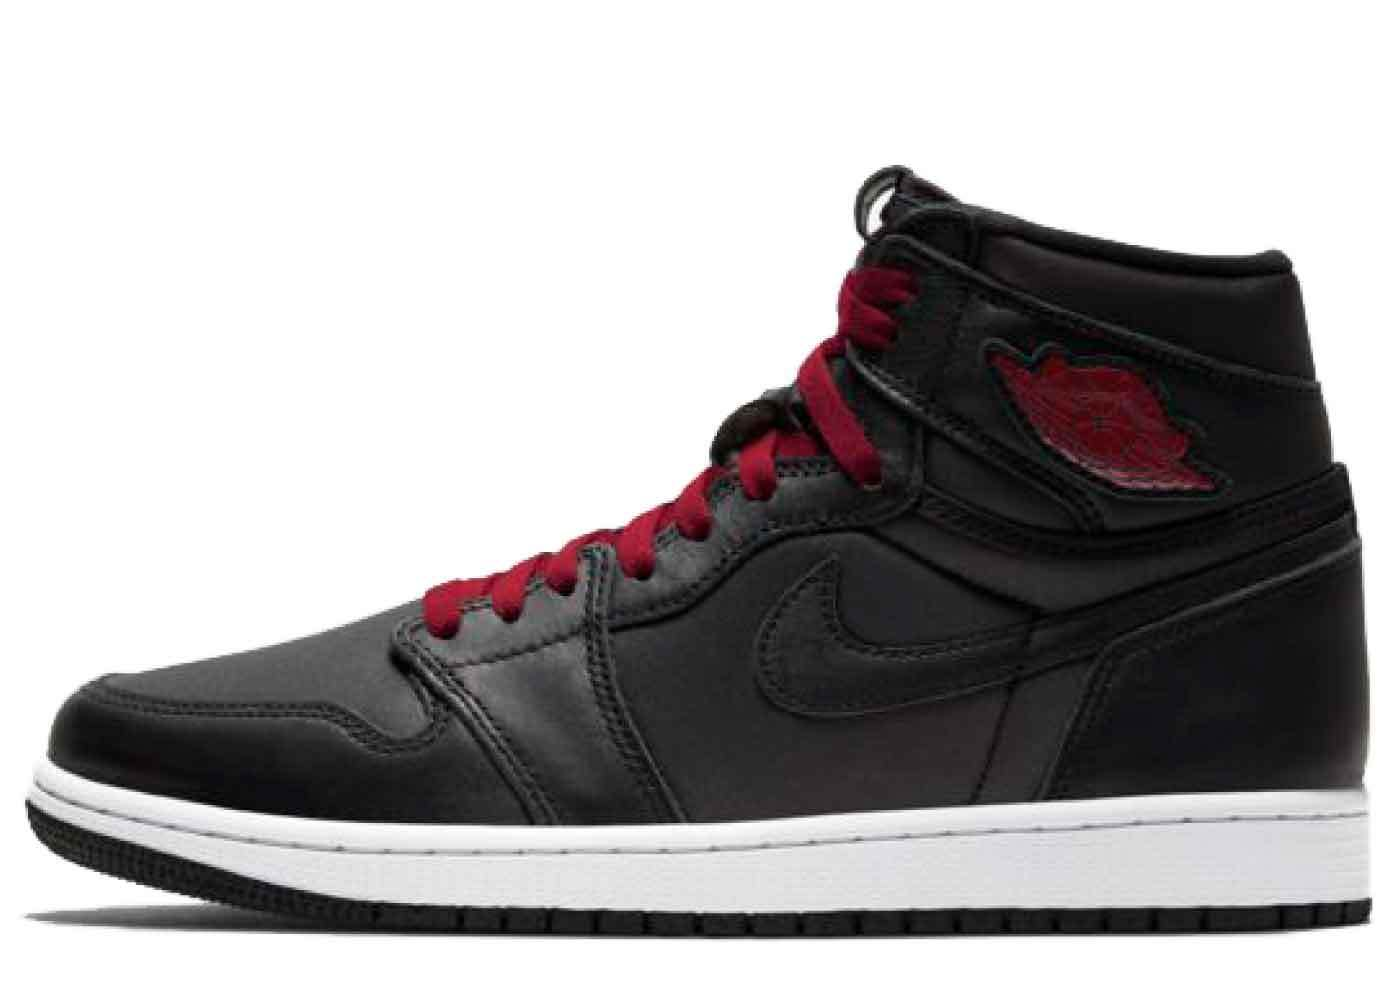 Nike Air Jordan 1 Retro High Black Gym Red Satinの写真